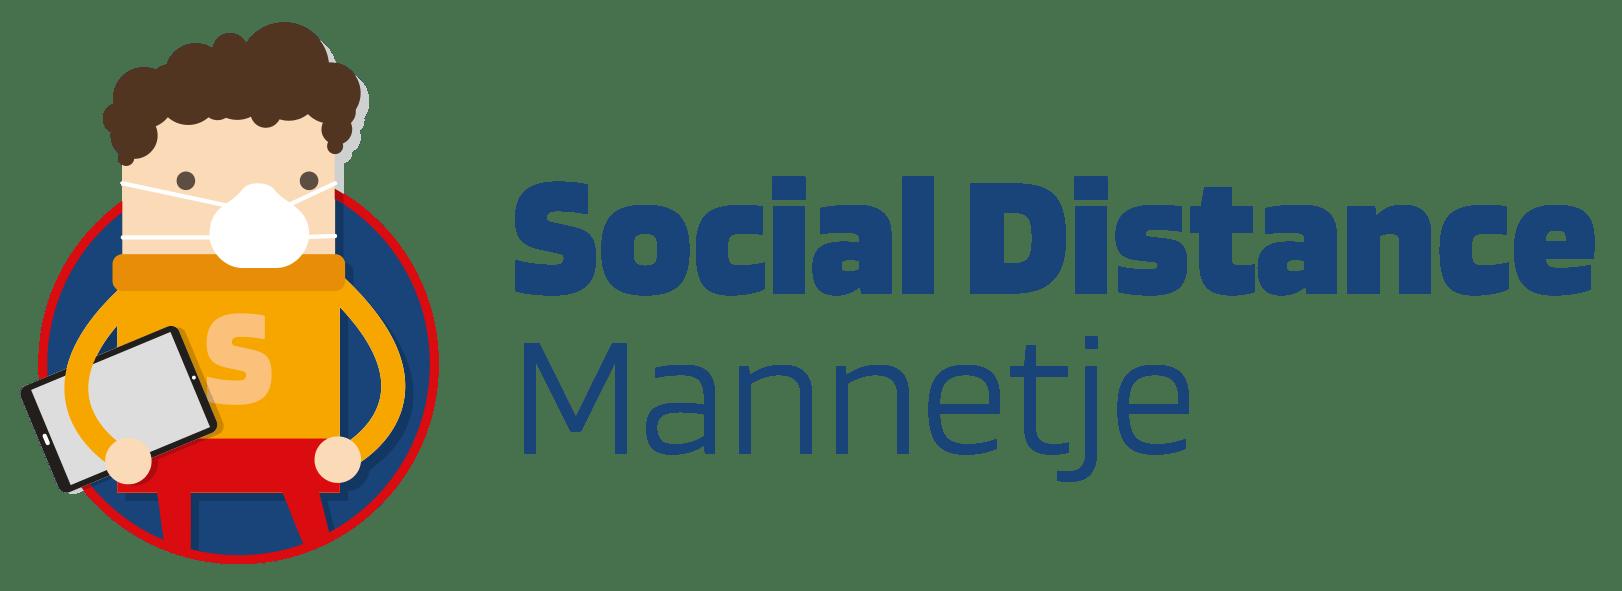 Social Distance Mannetje - Social Media Mannetje - Social Media Uitbesteden